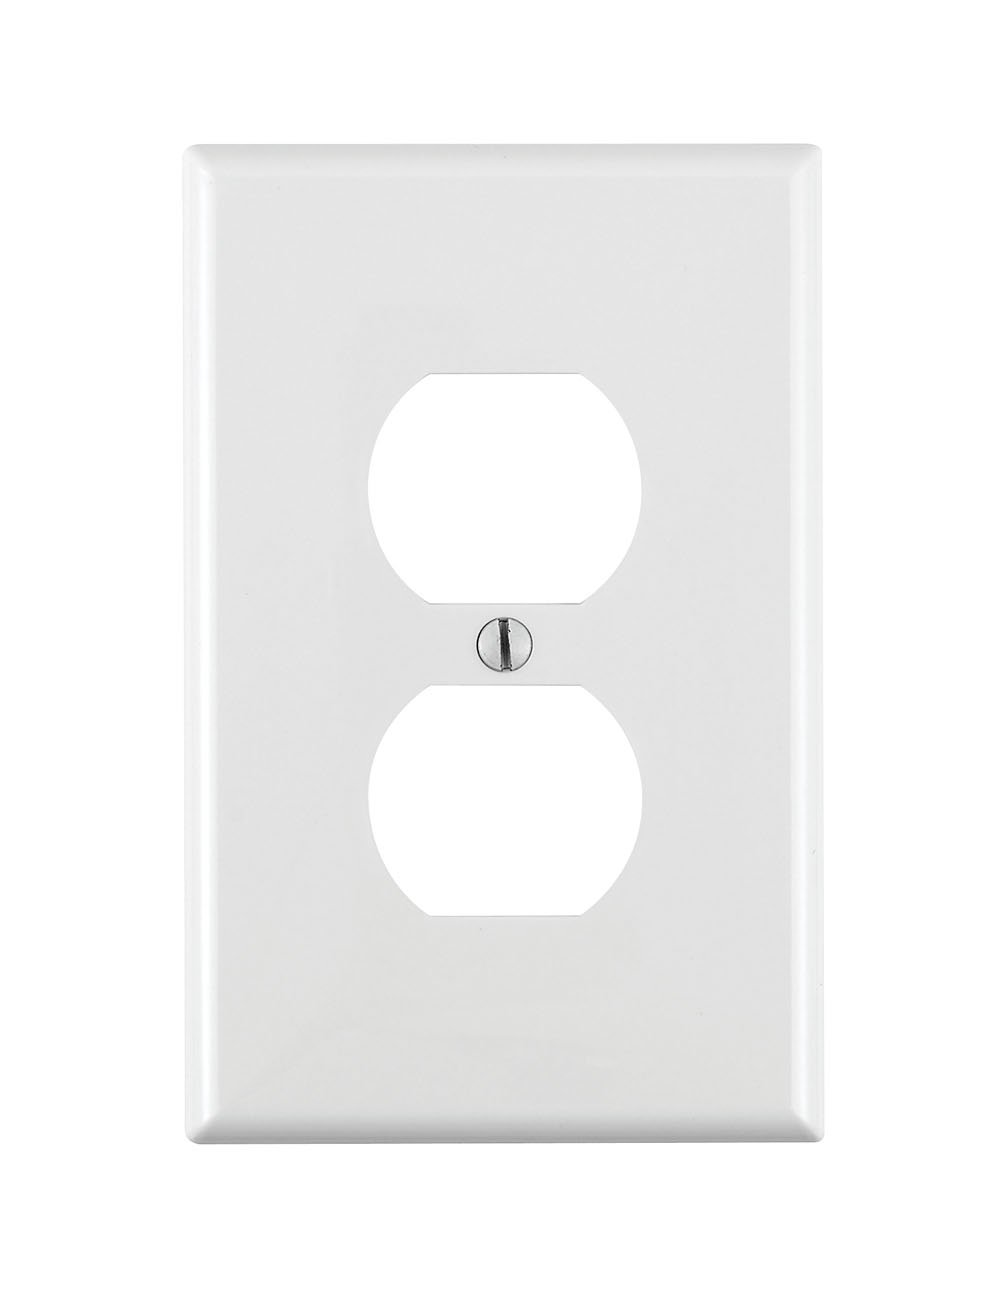 leviton pj8t 1gang 1duplex midway nylon wallplate midway size light almond outlet plates amazoncom